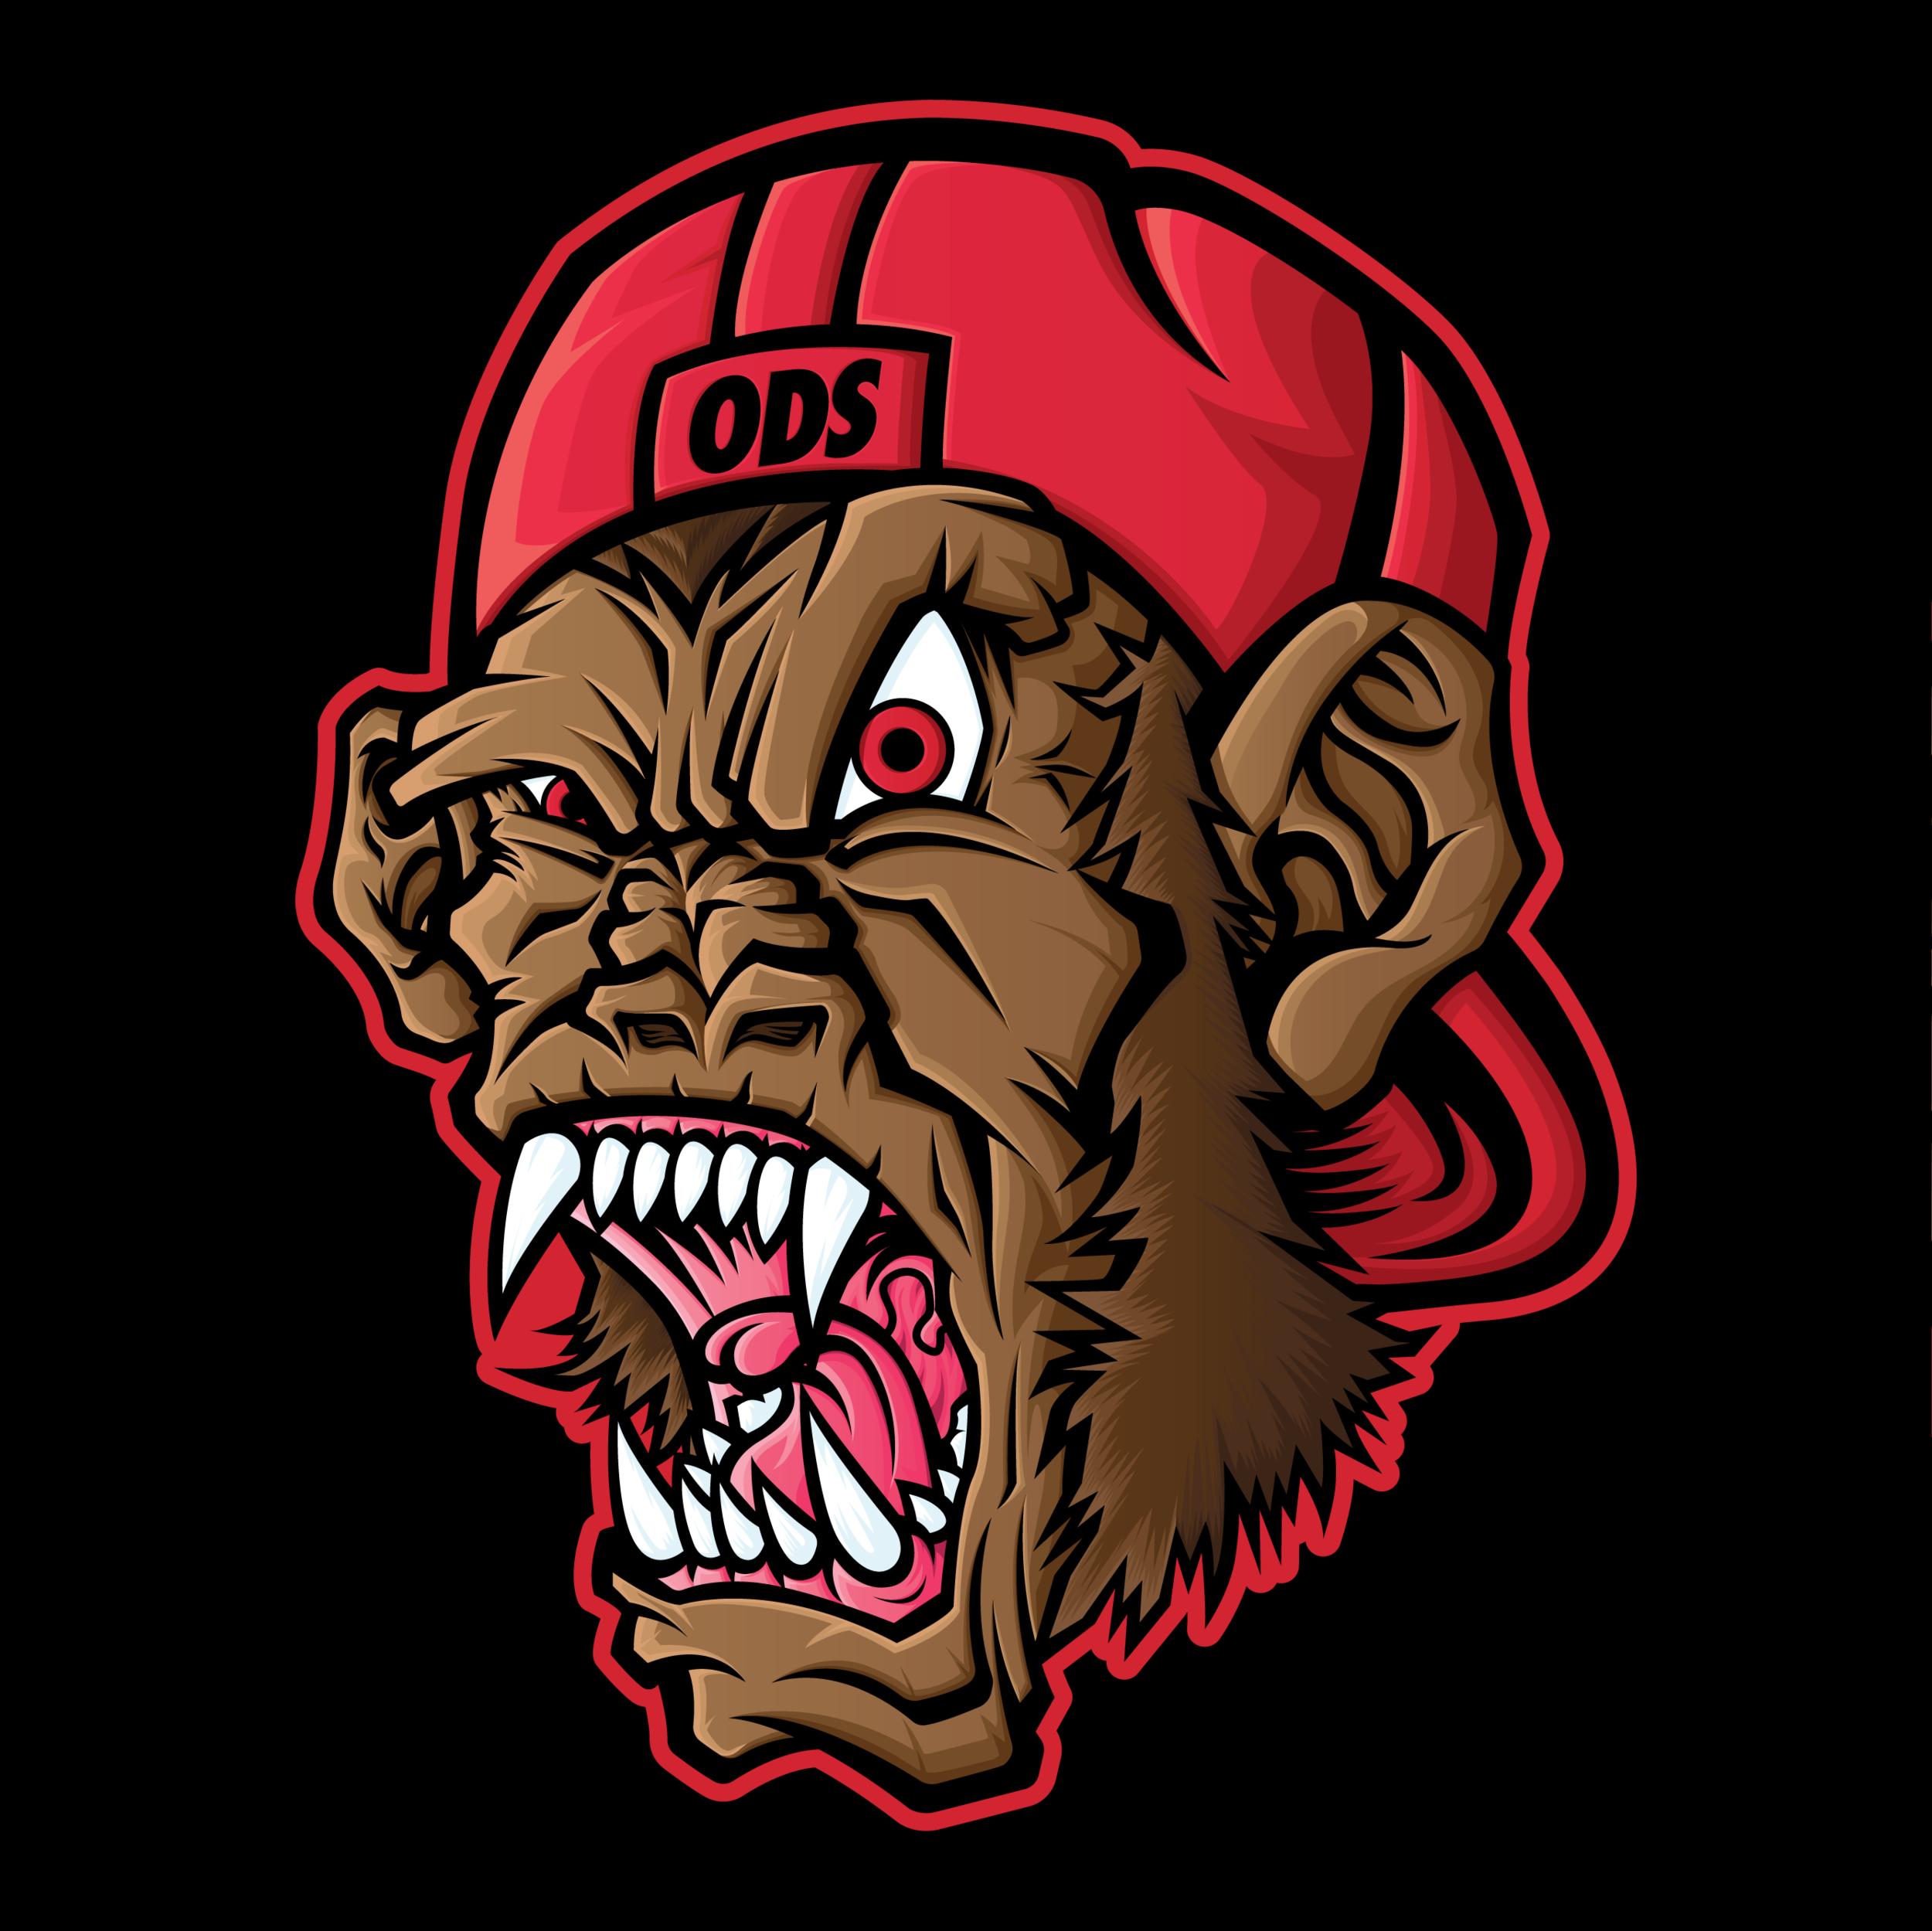 ODS-orozcodesign-monkey-ape,chimp-illustration-vector-illustrator-artist-roberto-orozco-digital-design.jpg